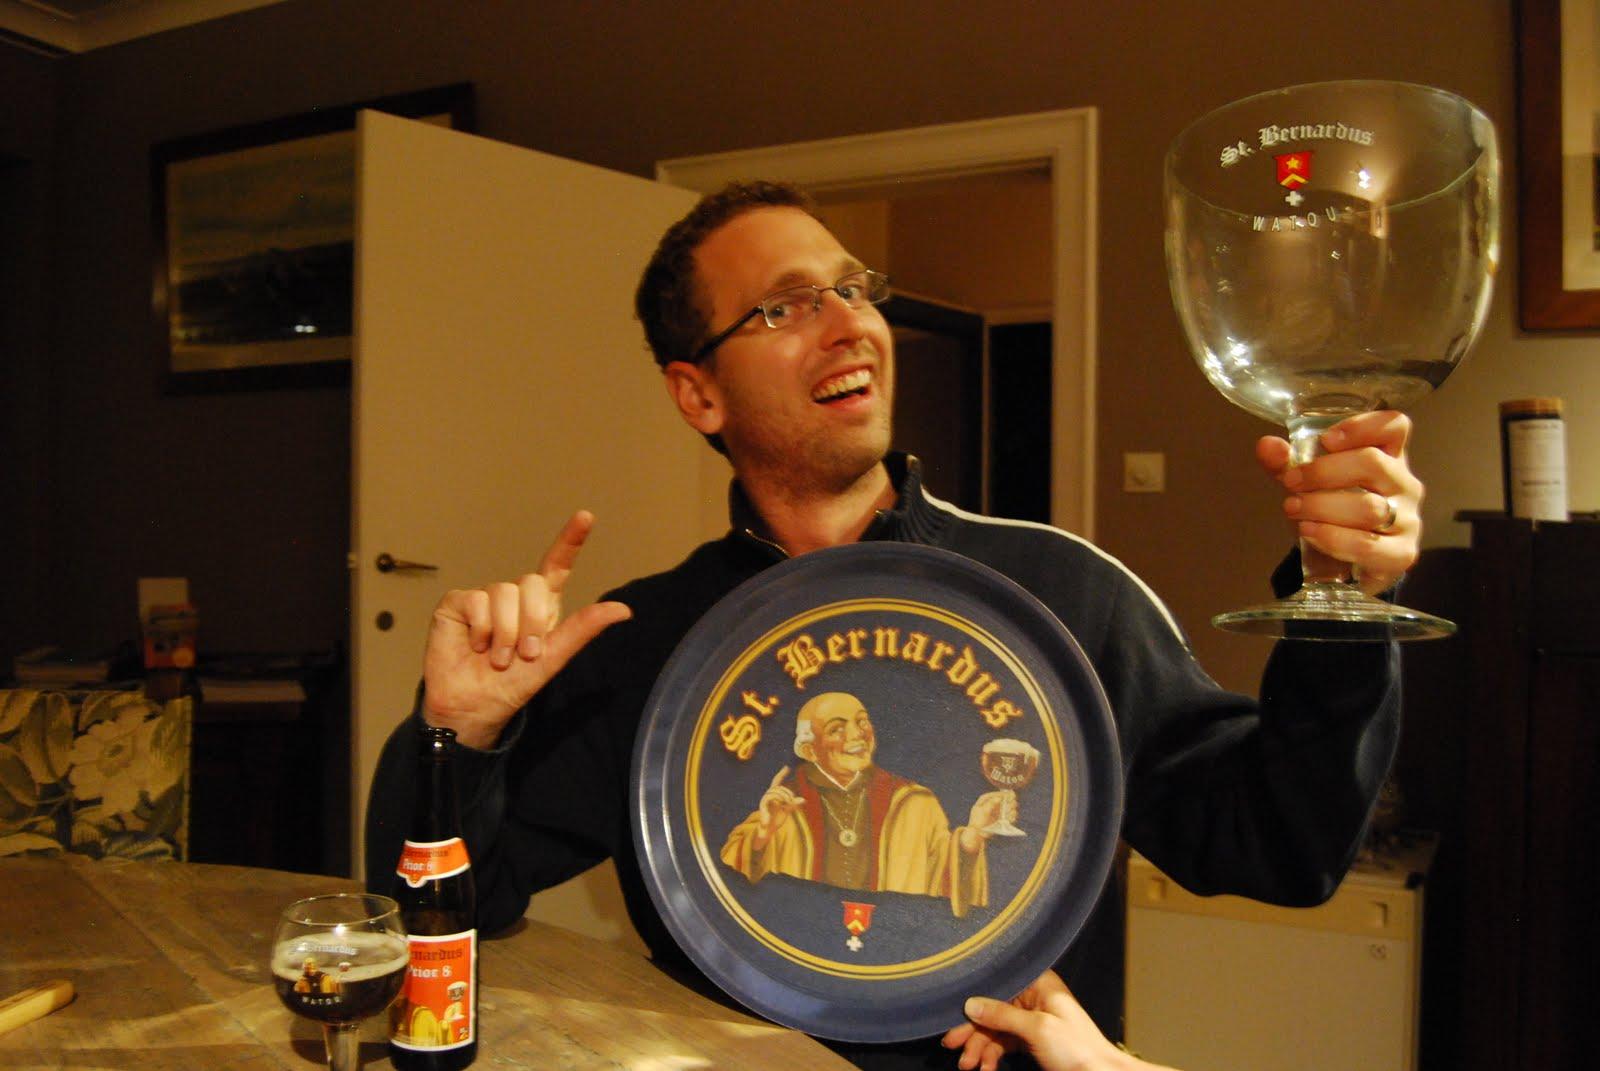 Saint Bernardus Brewery Tour